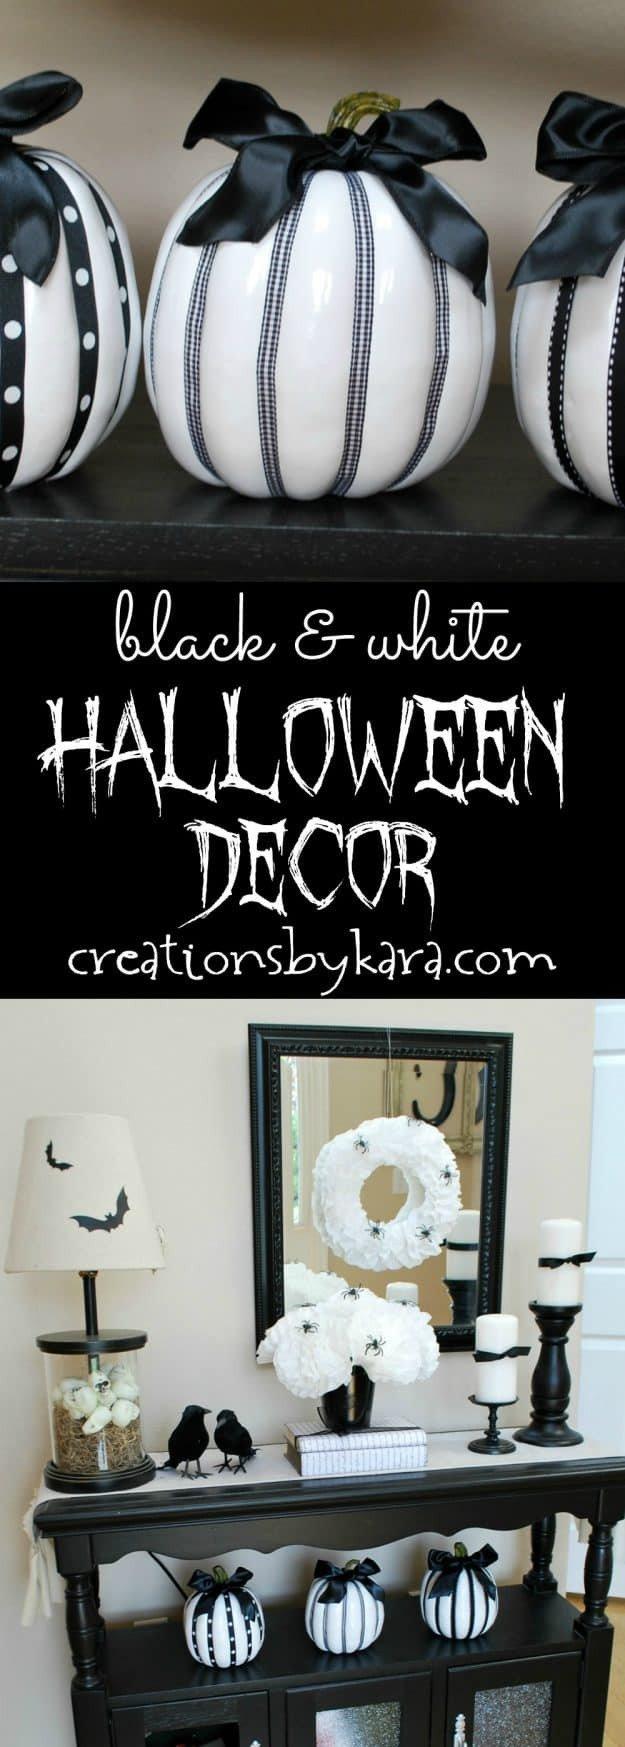 Black and White Halloween Decor Inspirational Black and White Halloween Decor